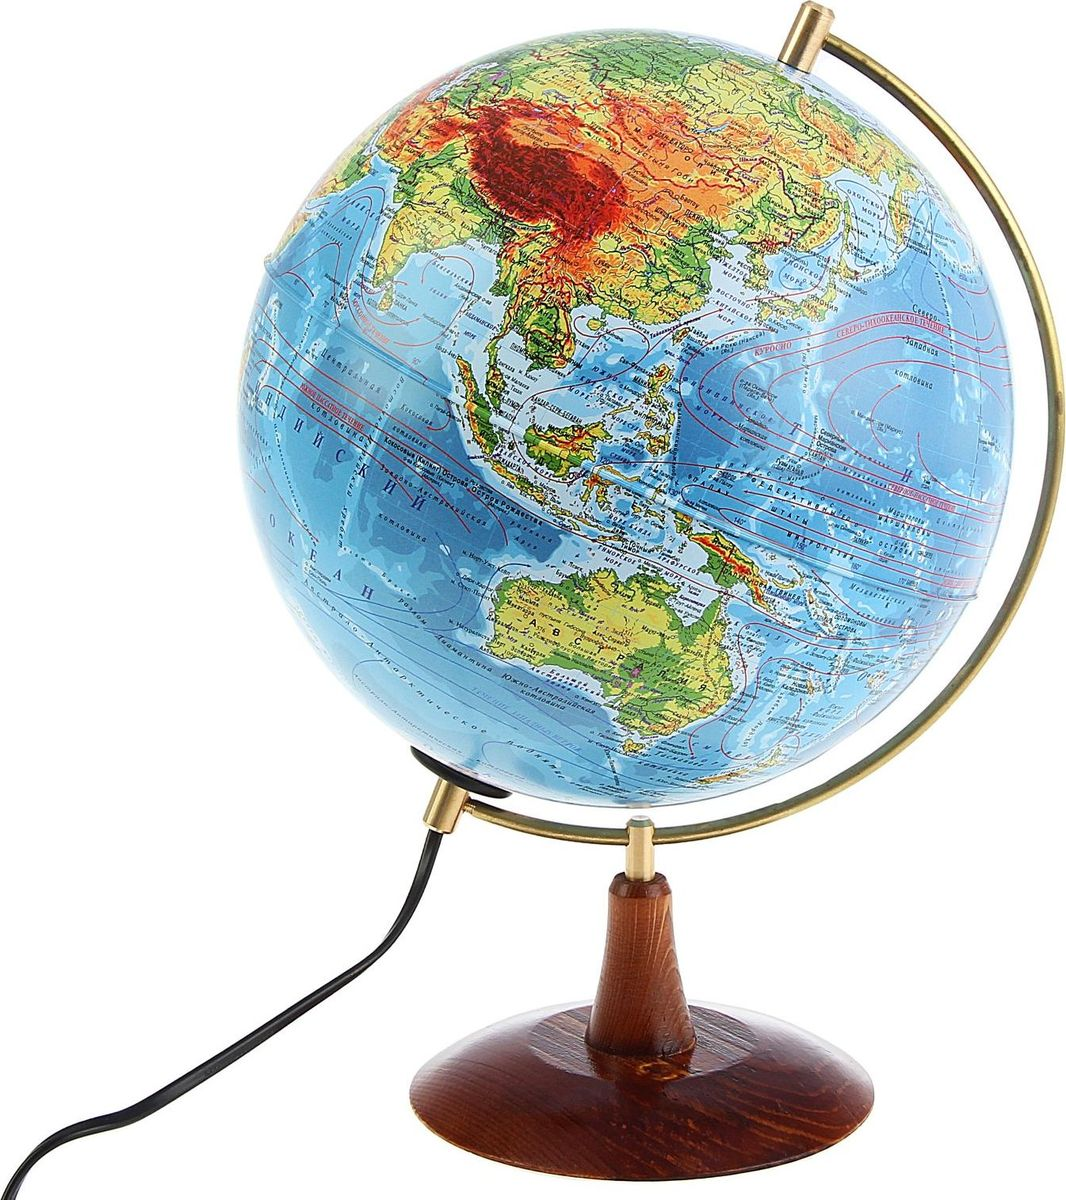 Глобен Глобус физический Элеганс диаметр 25 см1300411